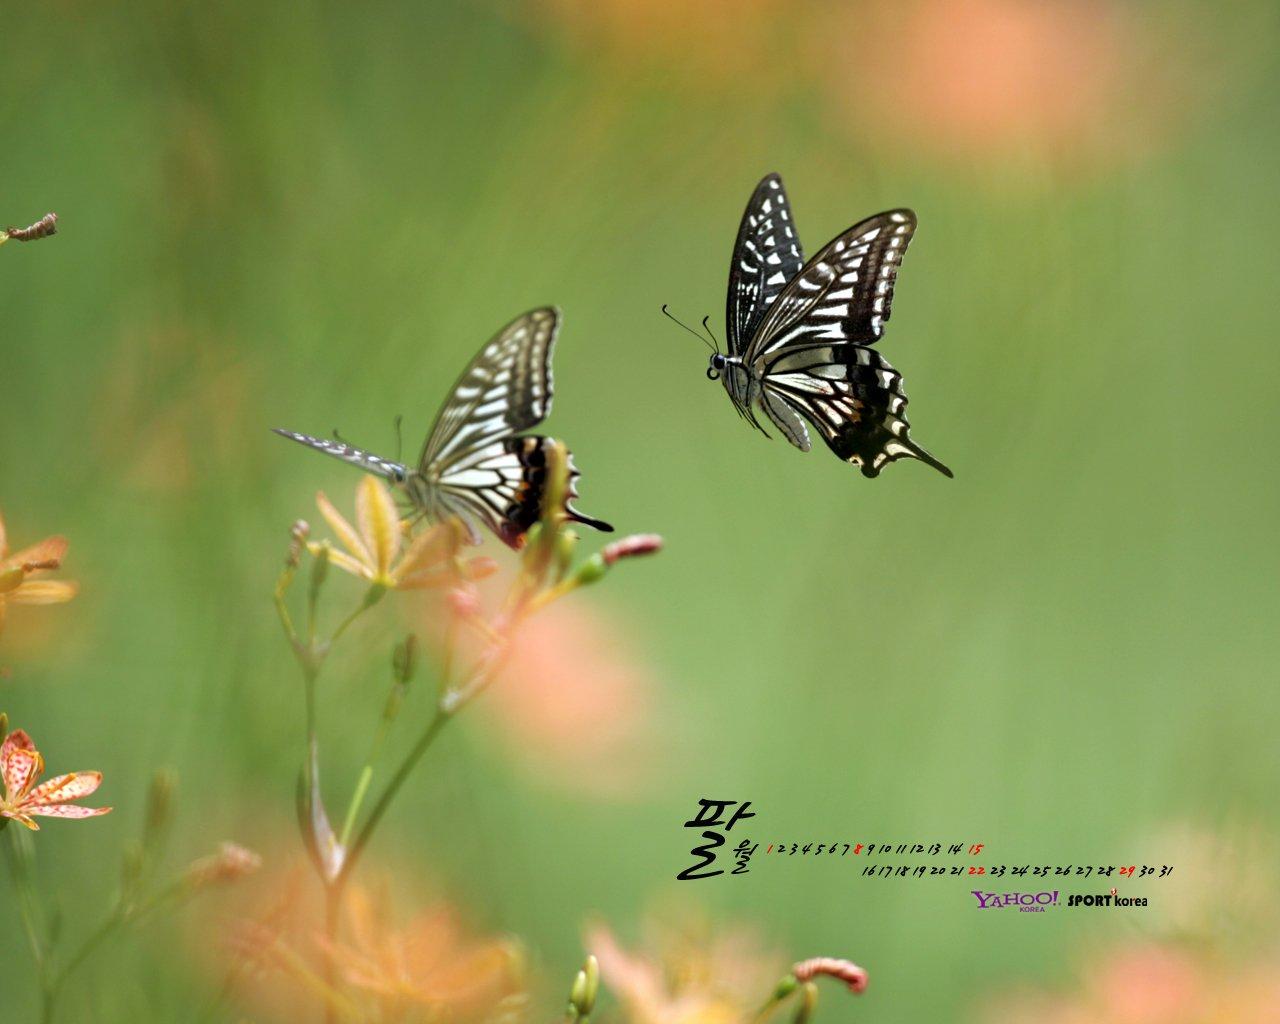 YAHOO South Korea in August Calendar 12088   World Wallpapers 1280x1024